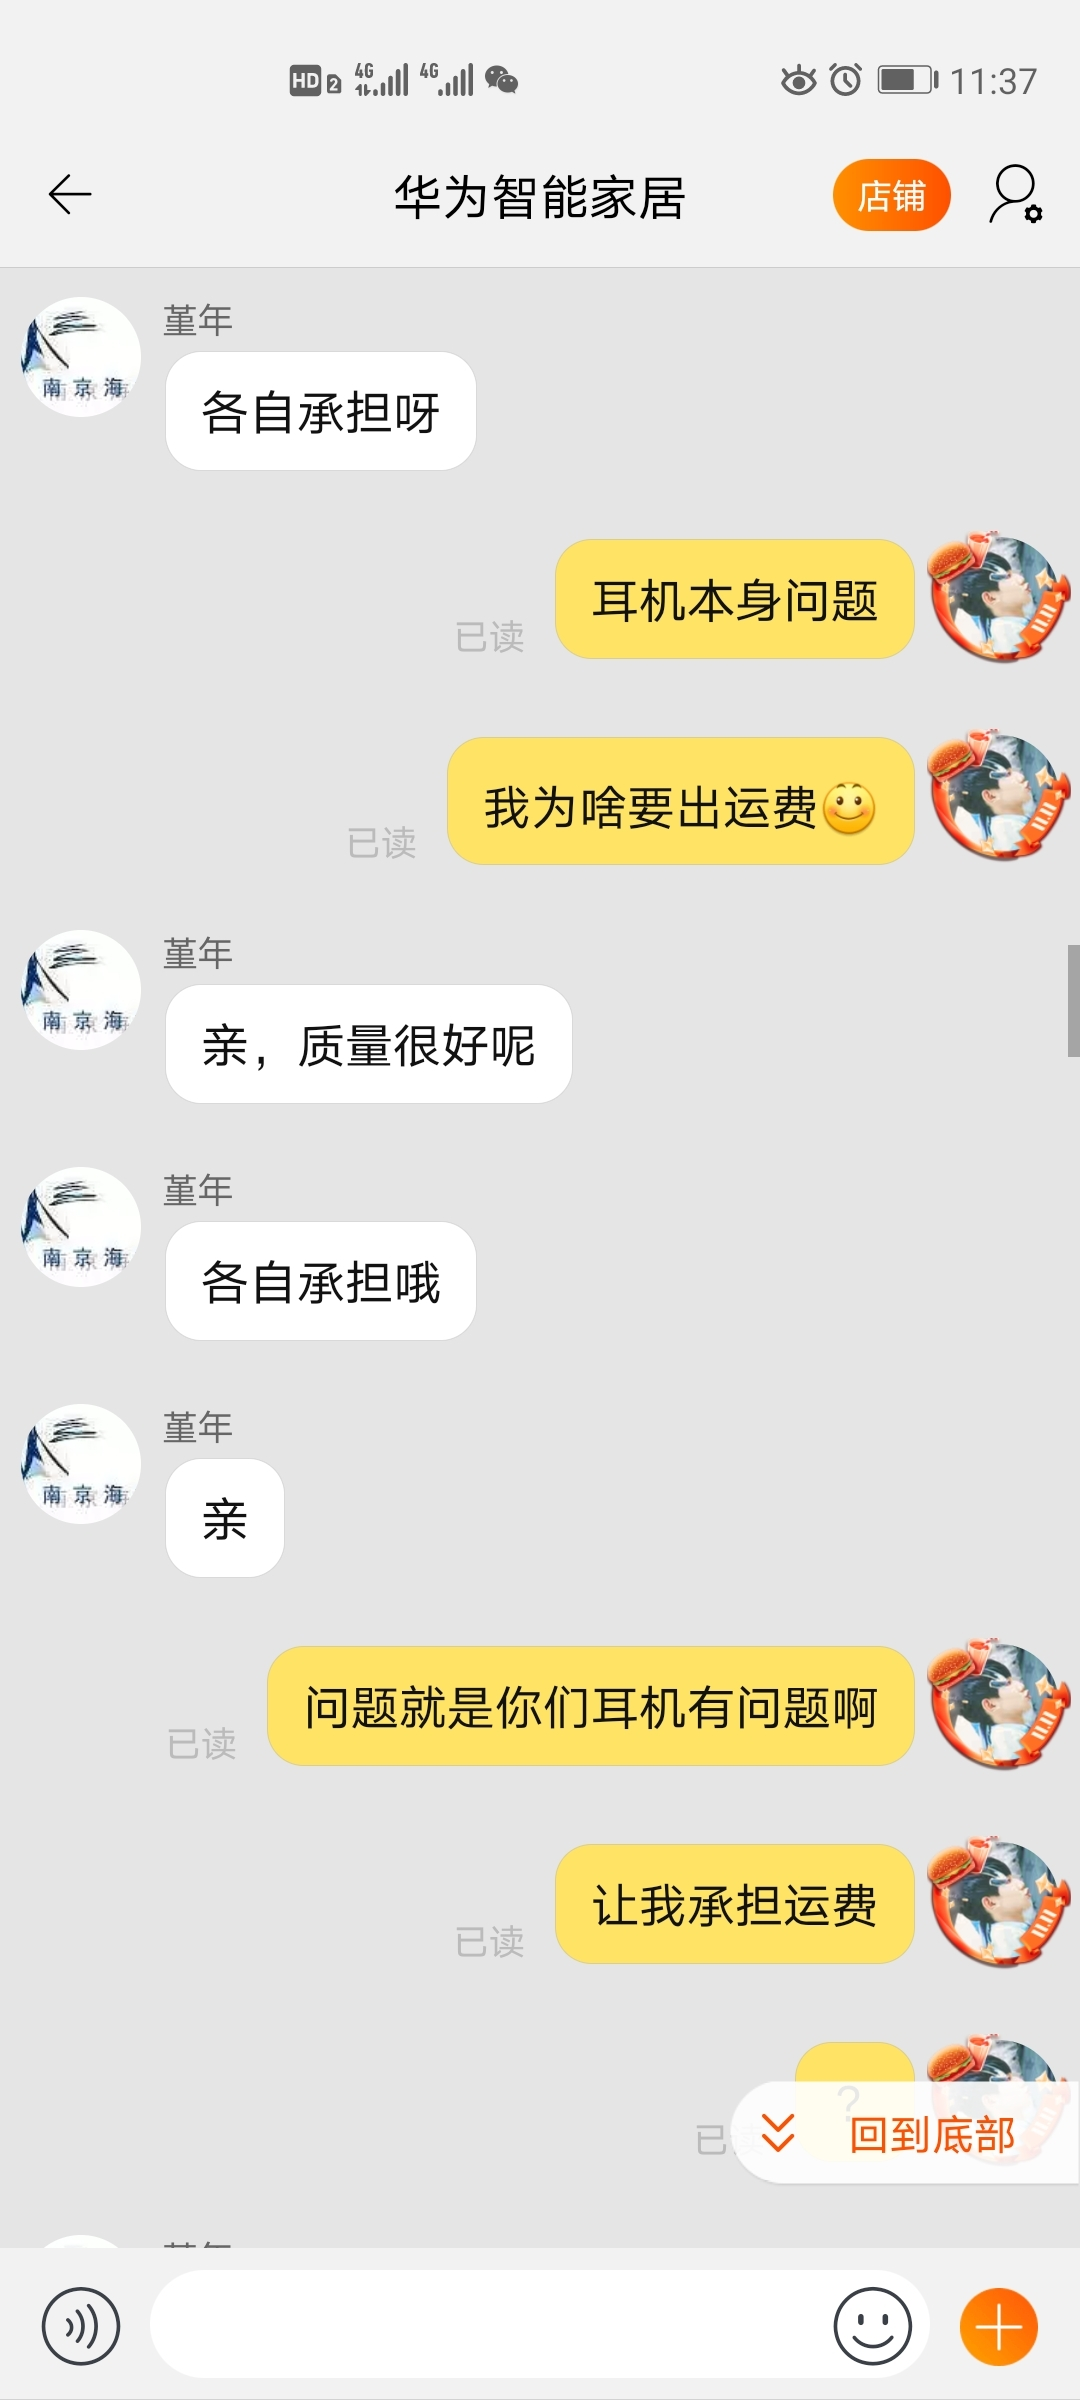 Screenshot_20200508_113736_com.taobao.taobao.jpg